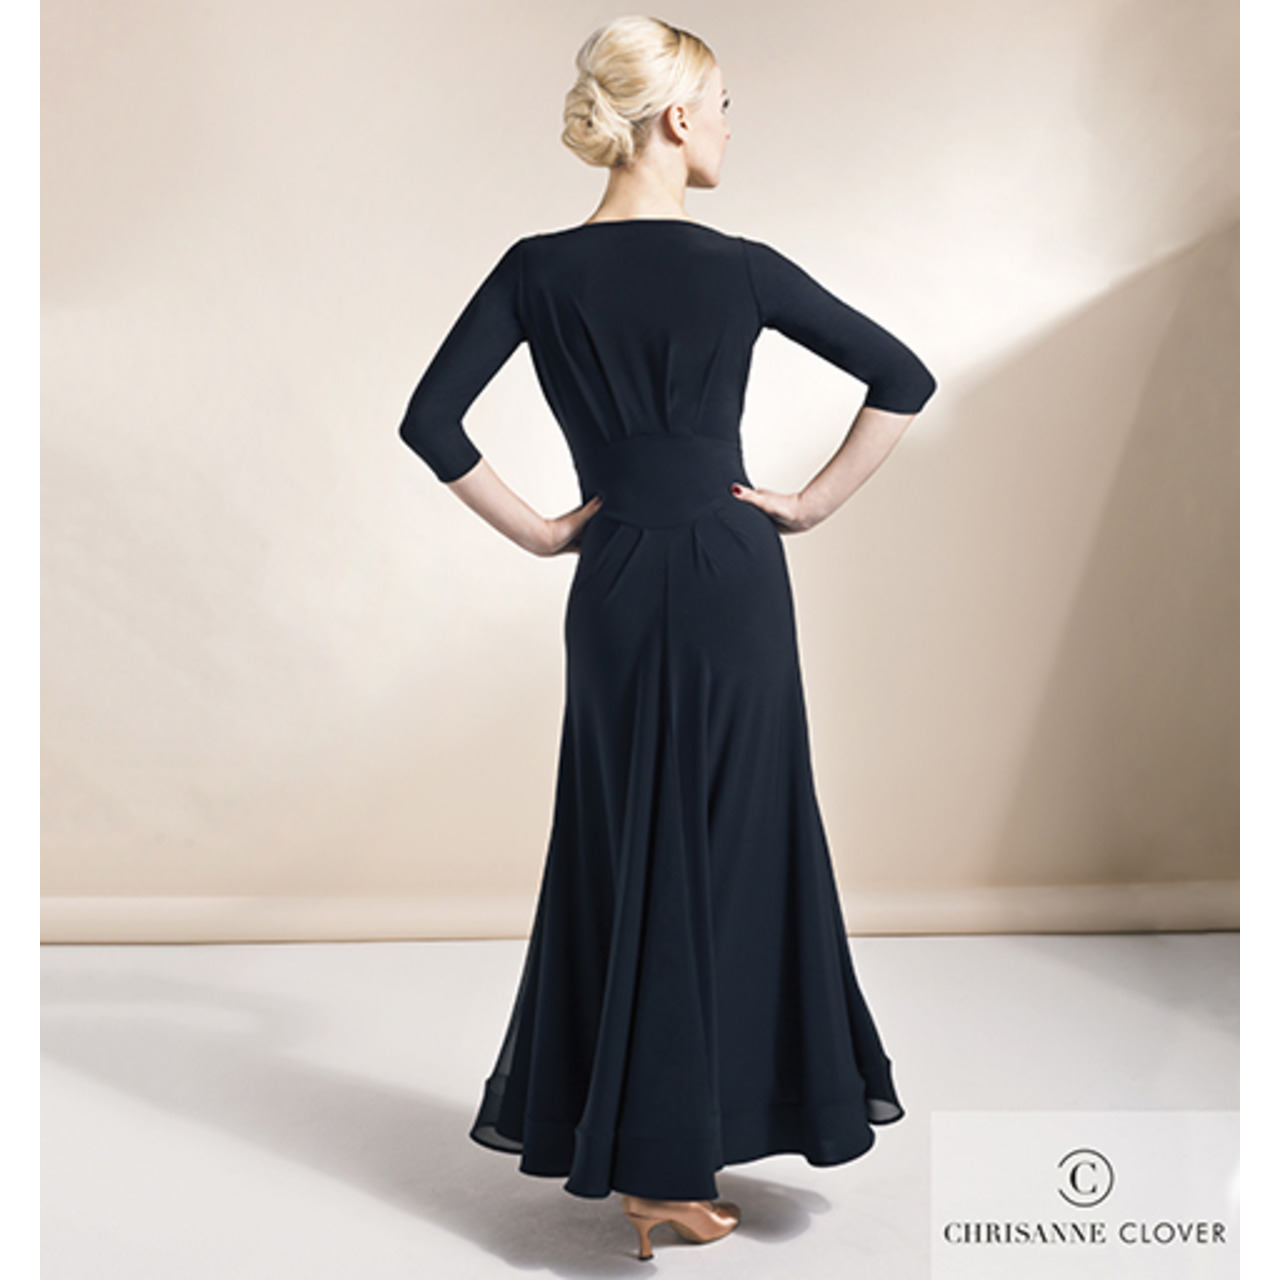 IMPERIAL BALLROOM DRESS / BLAC (Платье Стандарт черное)